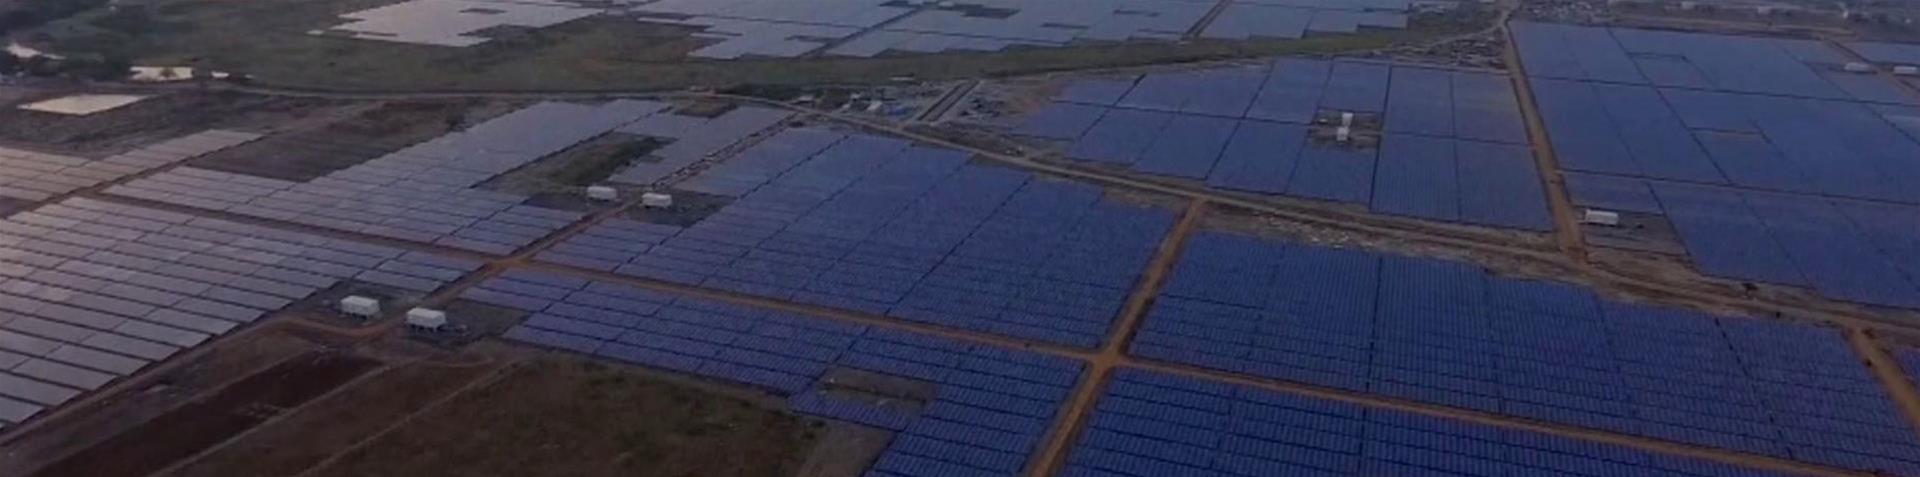 solar-power-plant-india